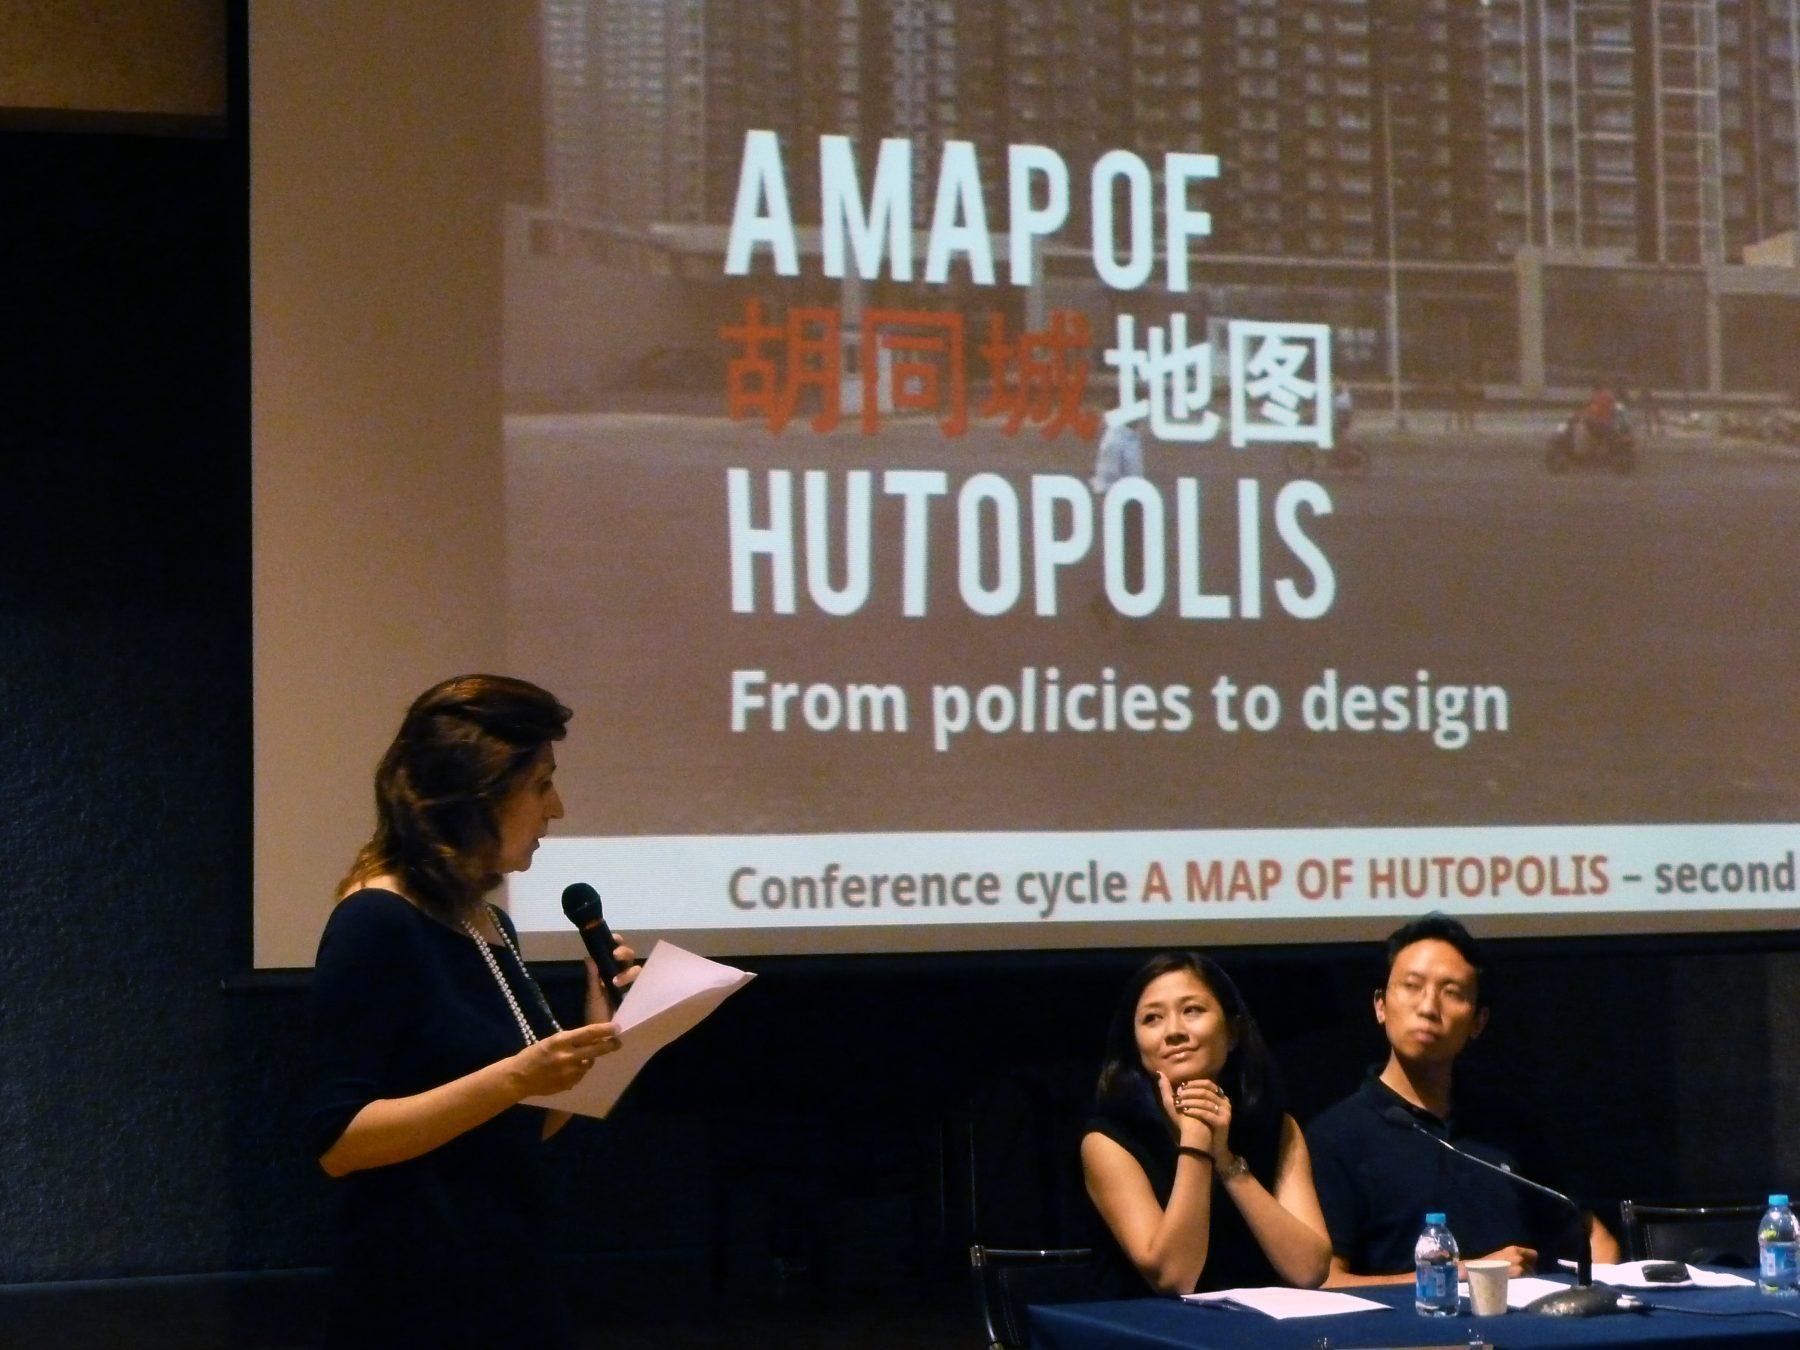 Matthew Hu, Toby Wong, Luis Aguirre Manso, Eugenia Murialdo, Celine Lamee, Italian Embassy, AQSO, hutopolis